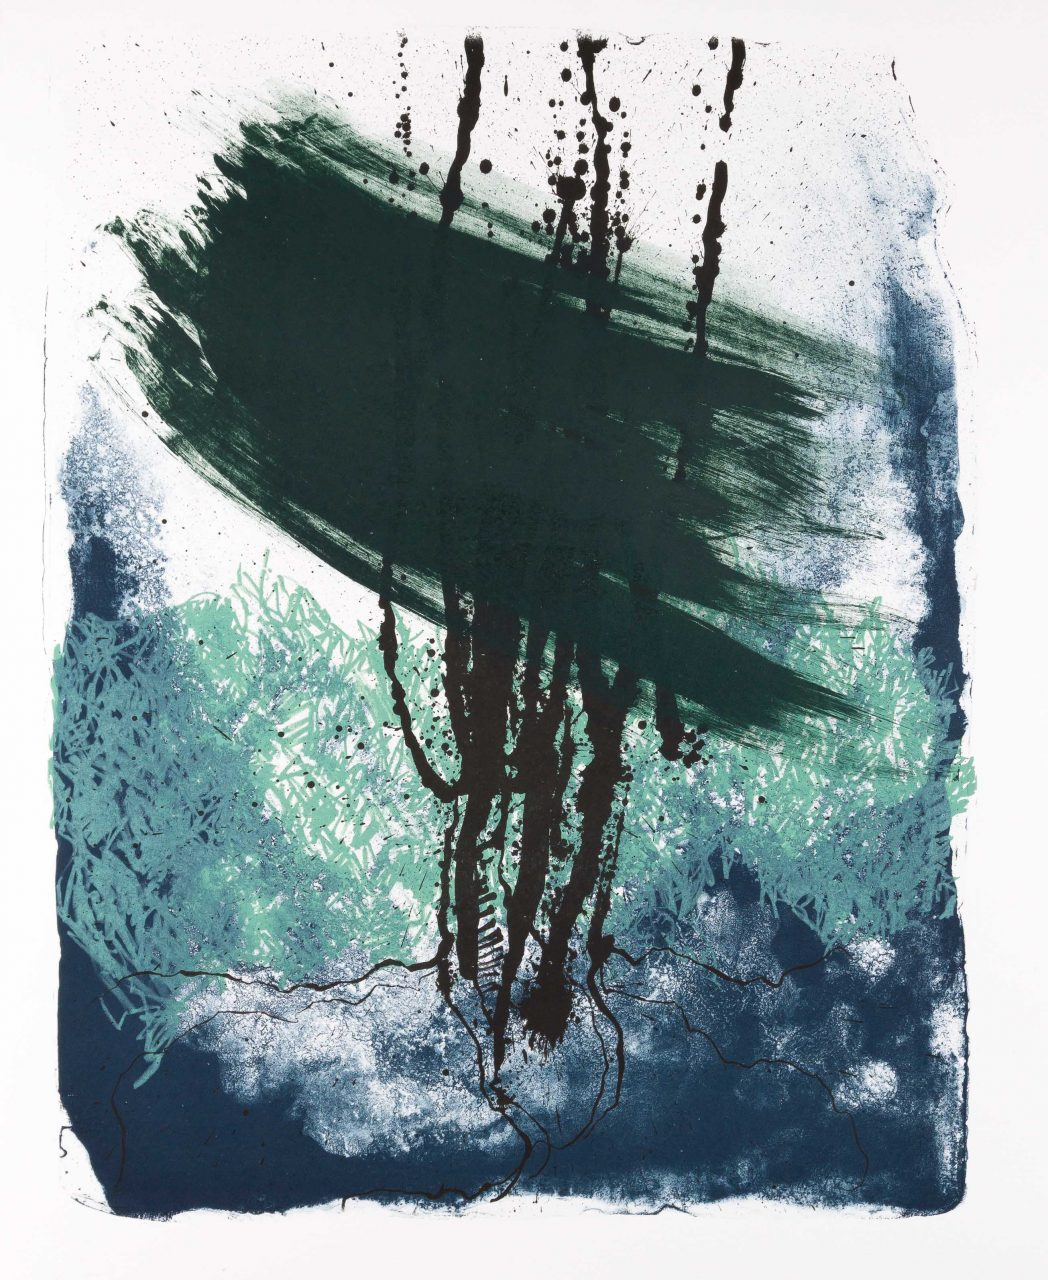 Wald X(F)-II, 2017, color lithograph, unique, 50x40 cm